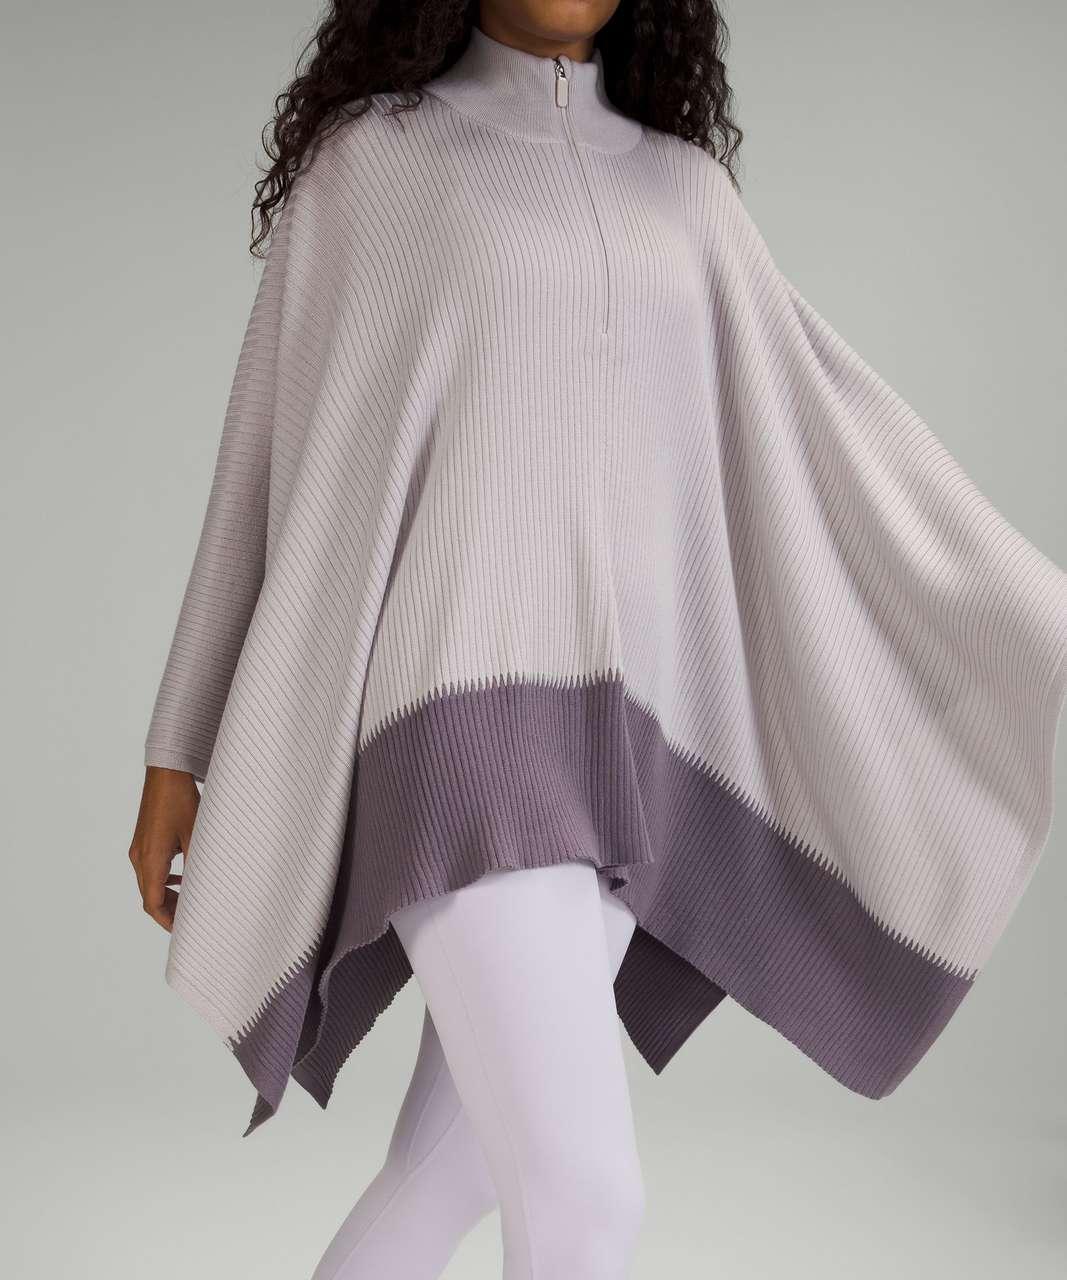 Lululemon On The Go Poncho - Chrome / Dusky Lavender